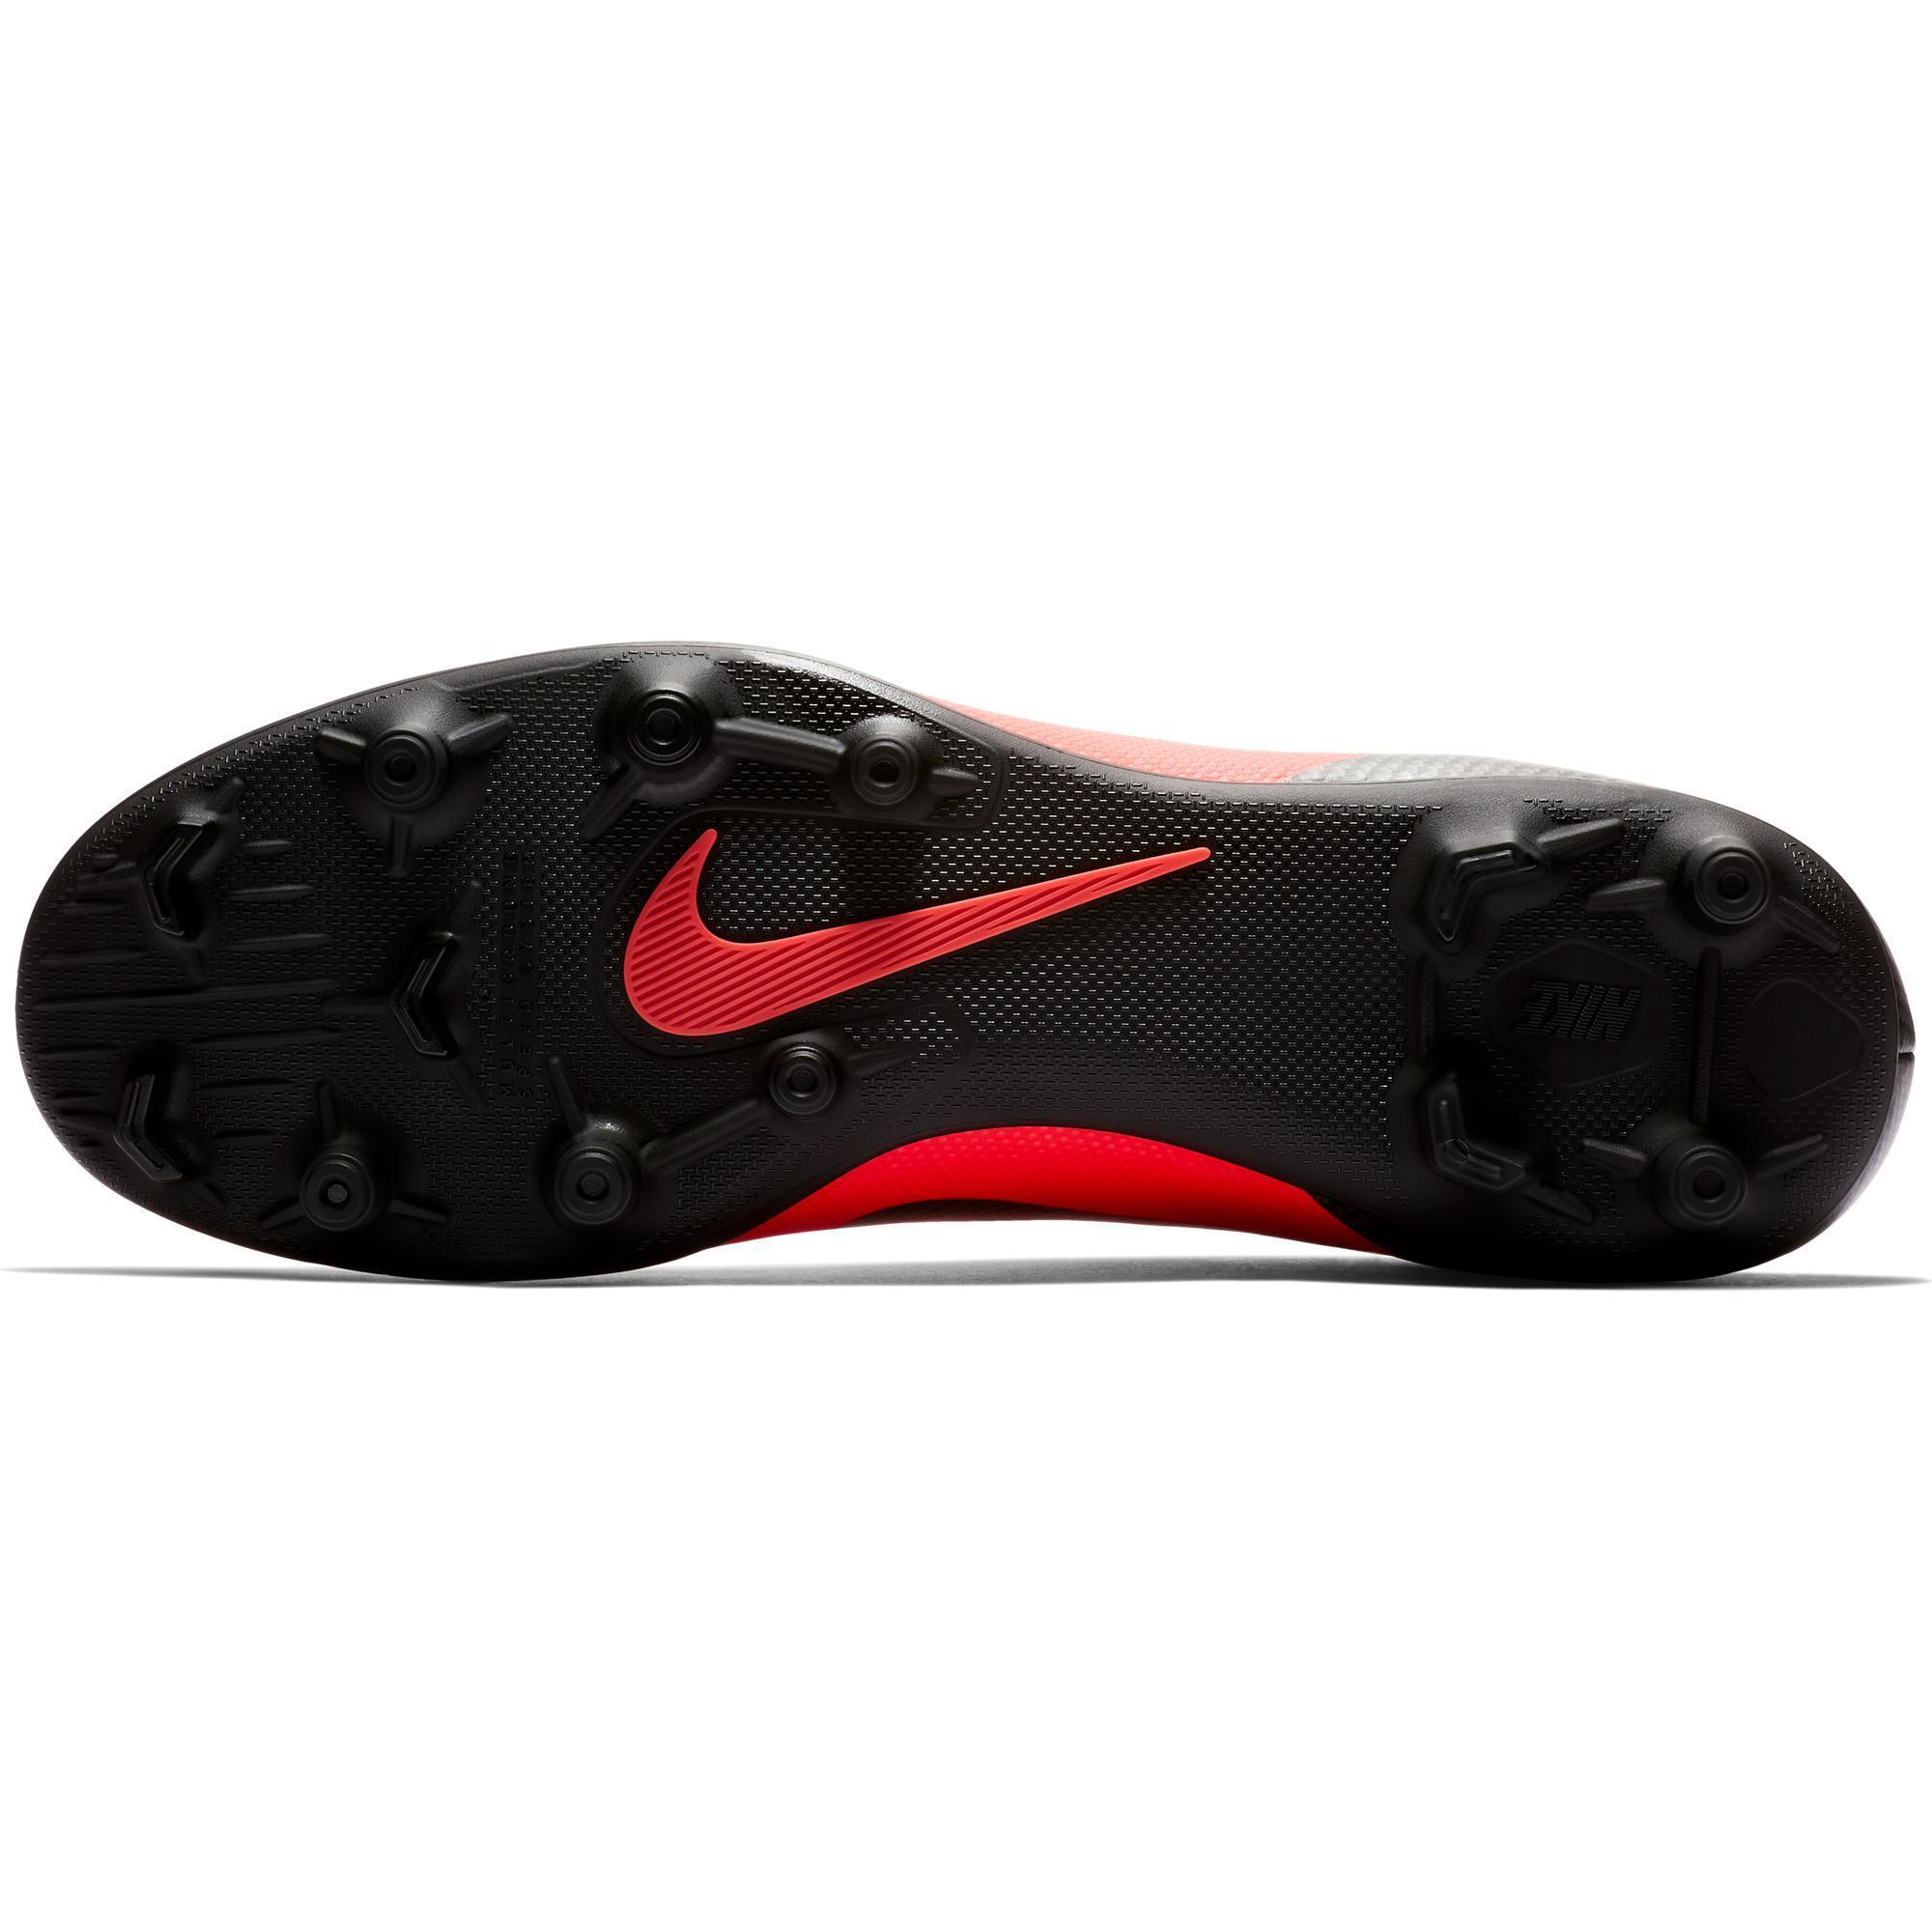 ... ebay botas de fútbol nike mercurial vapor xii academy cr7 mg adultos  rojo negro 9baca 0e7d1 7dc6a24a6d1fa